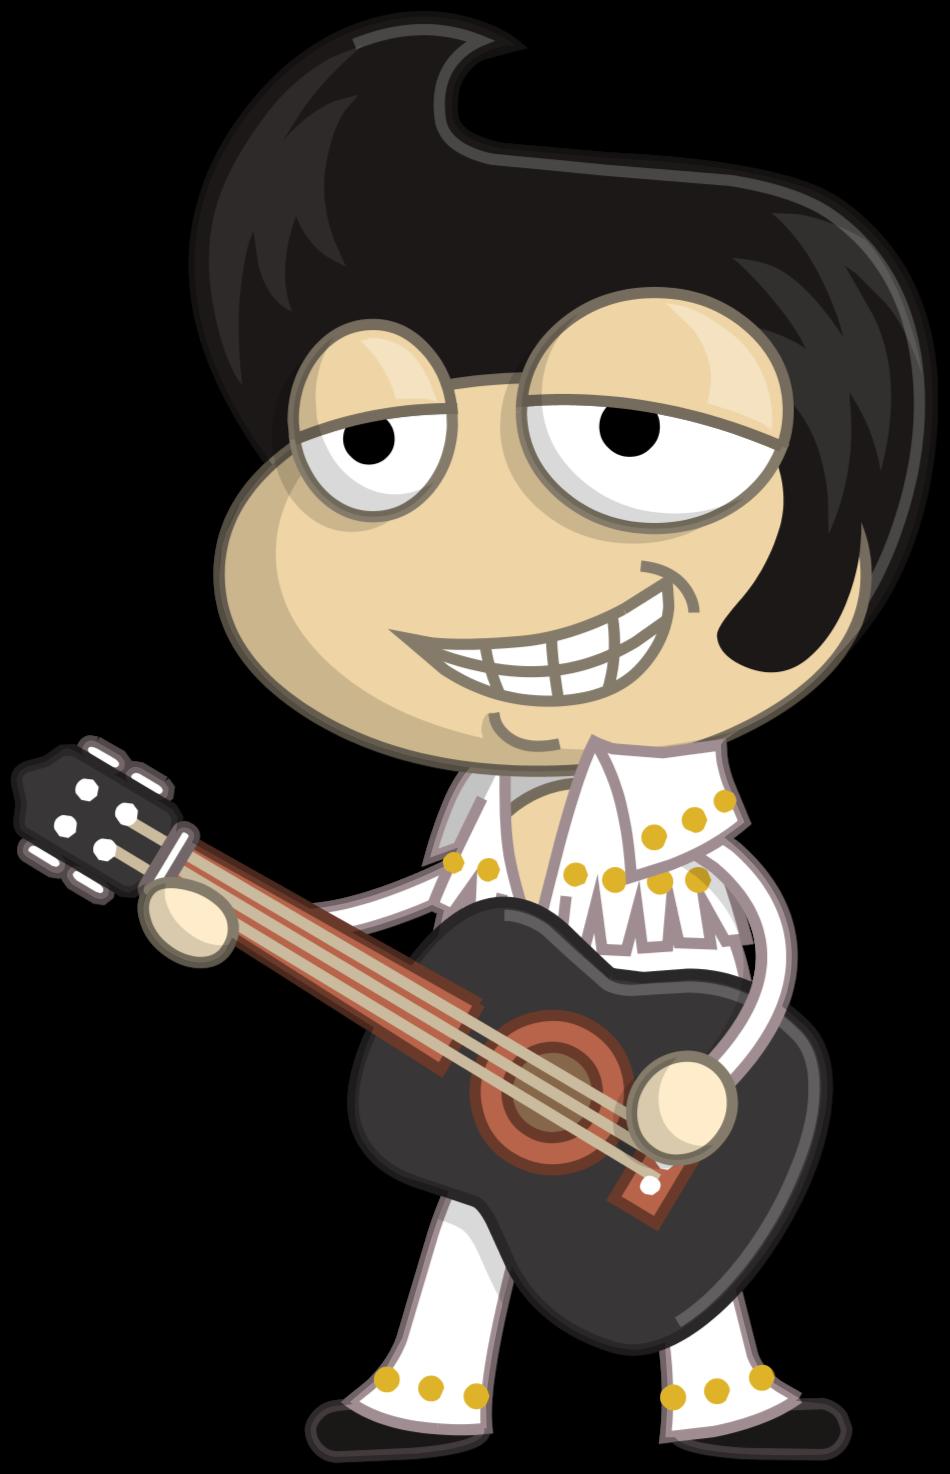 Clipart guitar guitar elvis. Presley poptropica wiki